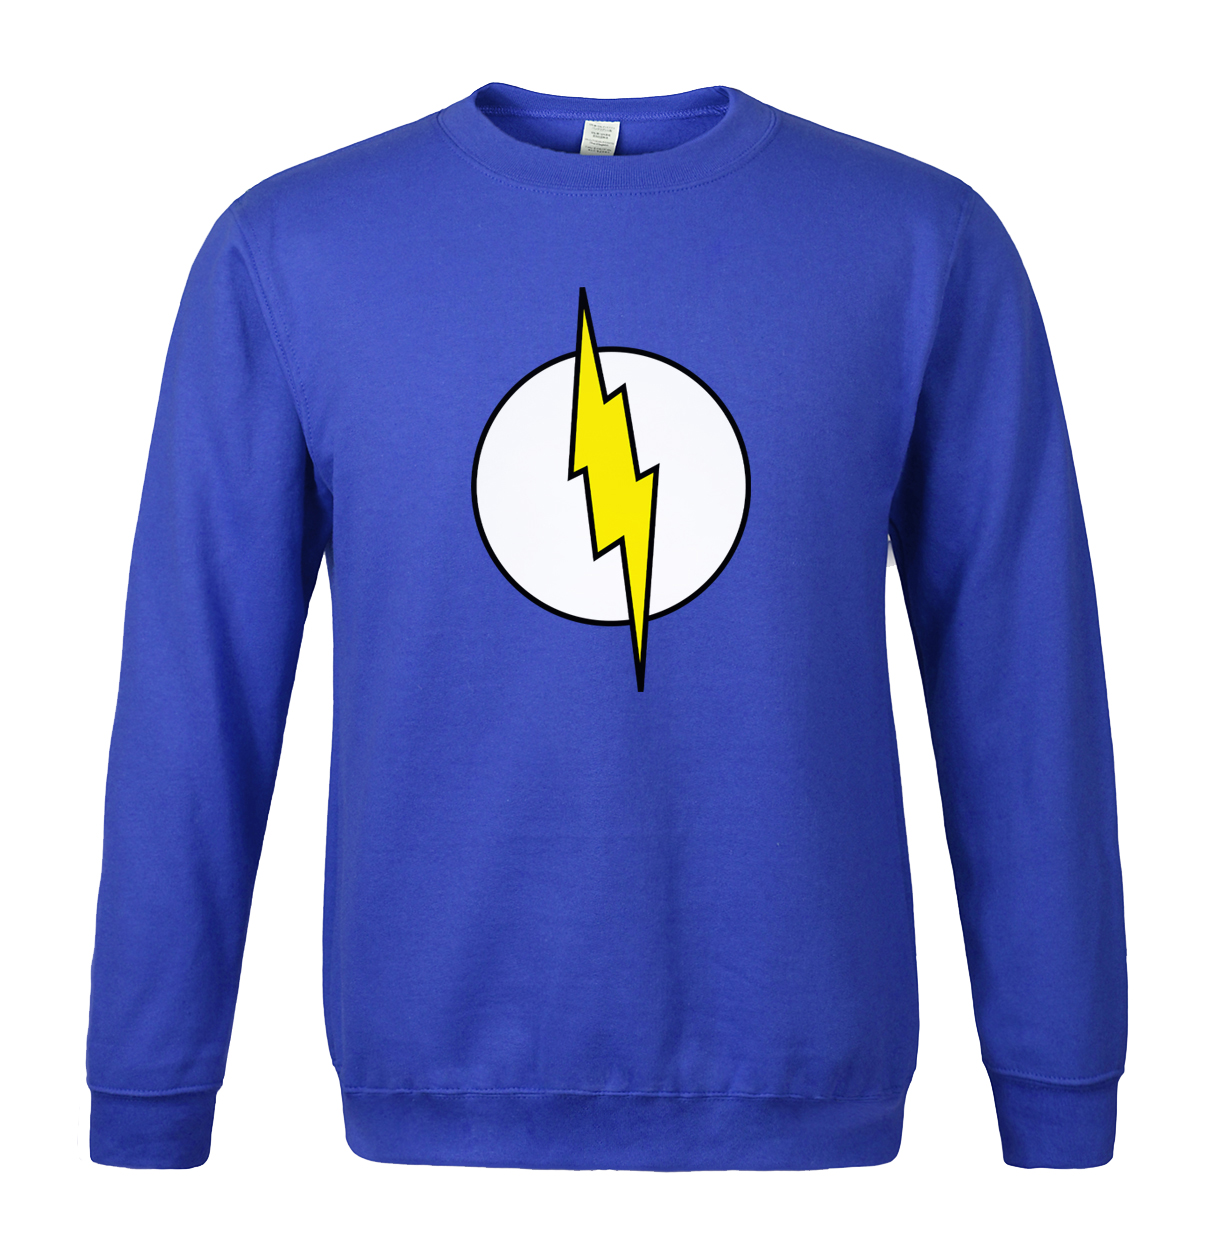 2019 men's sportswear Lightning Le Big Bang Theory Sheldon Cooper Foudre fleece hoodies sweatshirt tracksuits Crossfit hoody